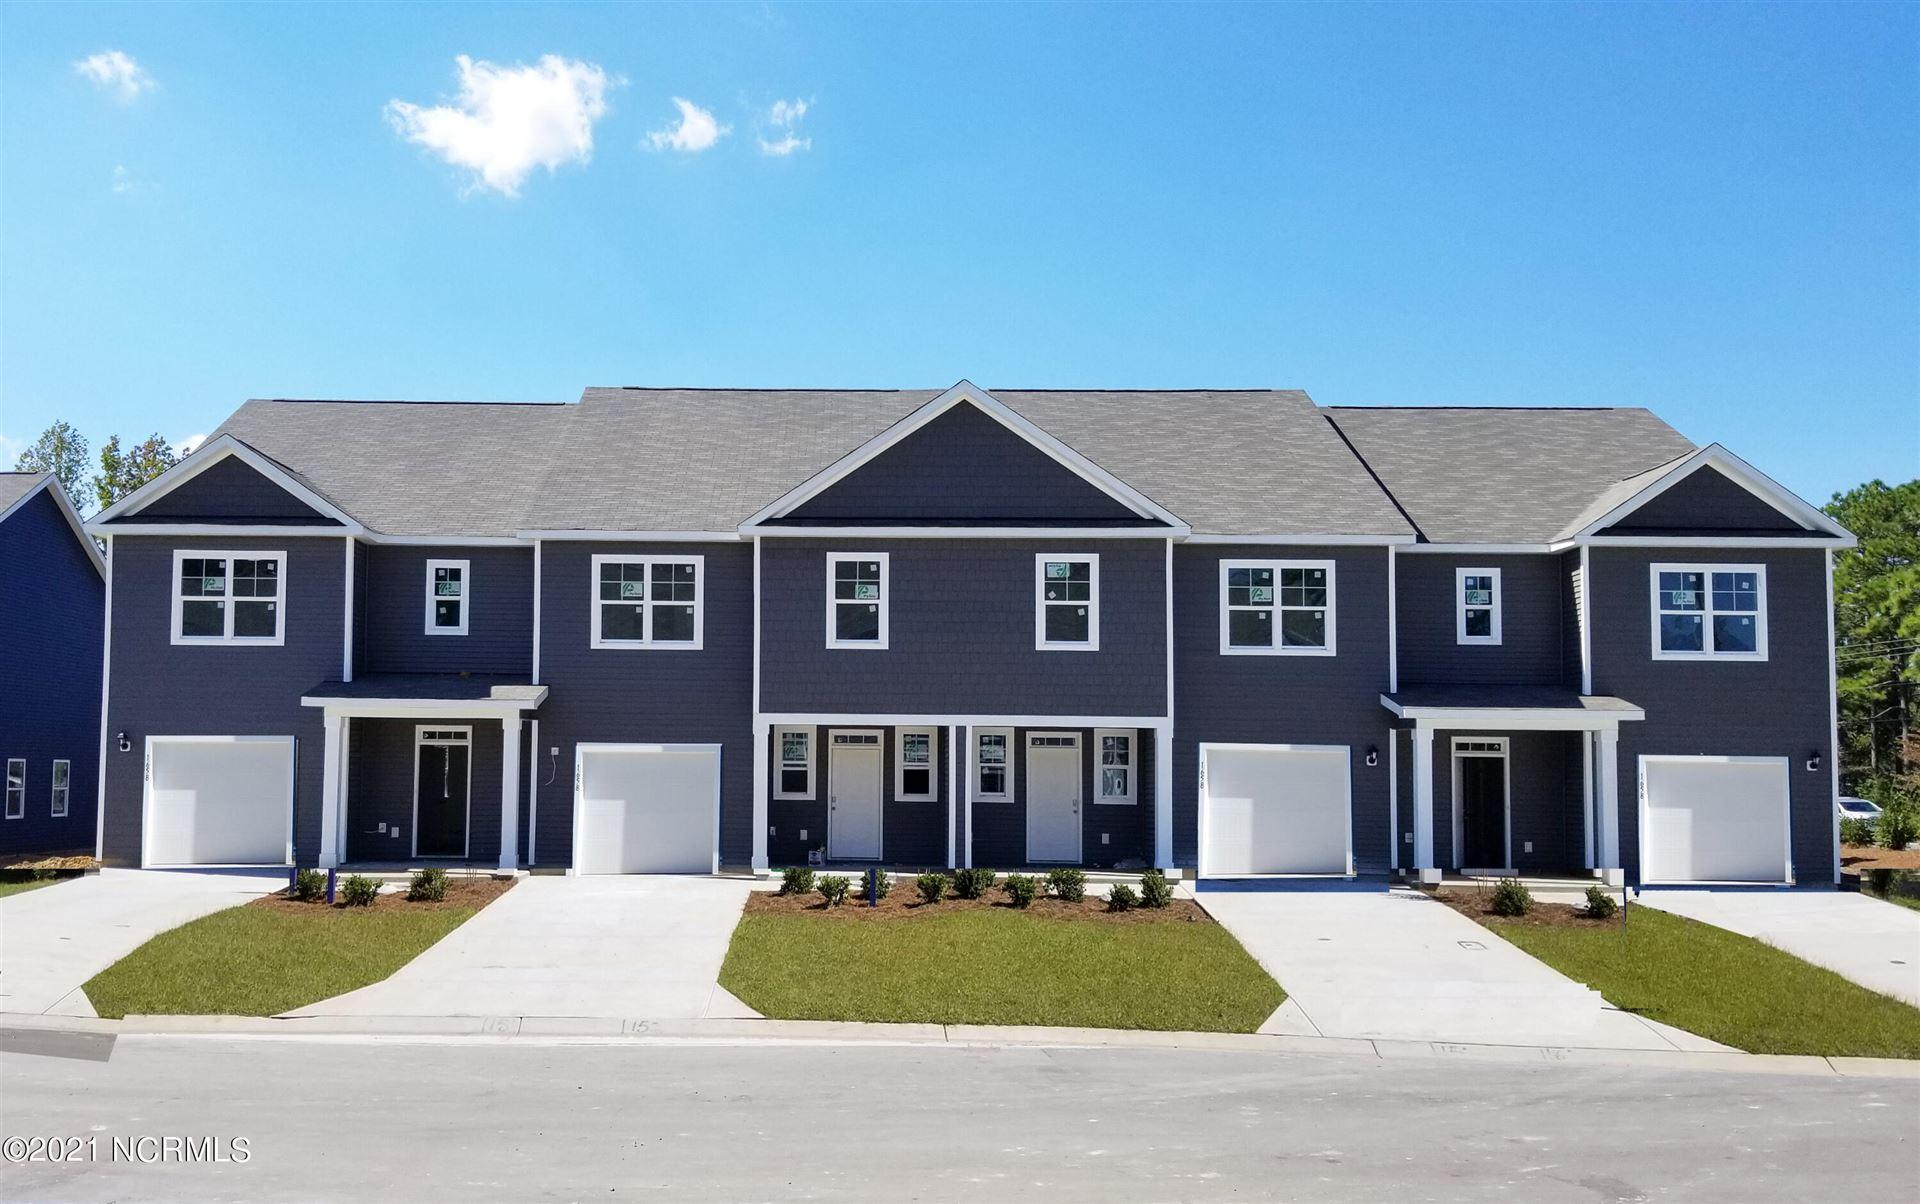 Photo for 1663 Killdeer Lane #Lot 1, Wilmington, NC 28411 (MLS # 100275058)